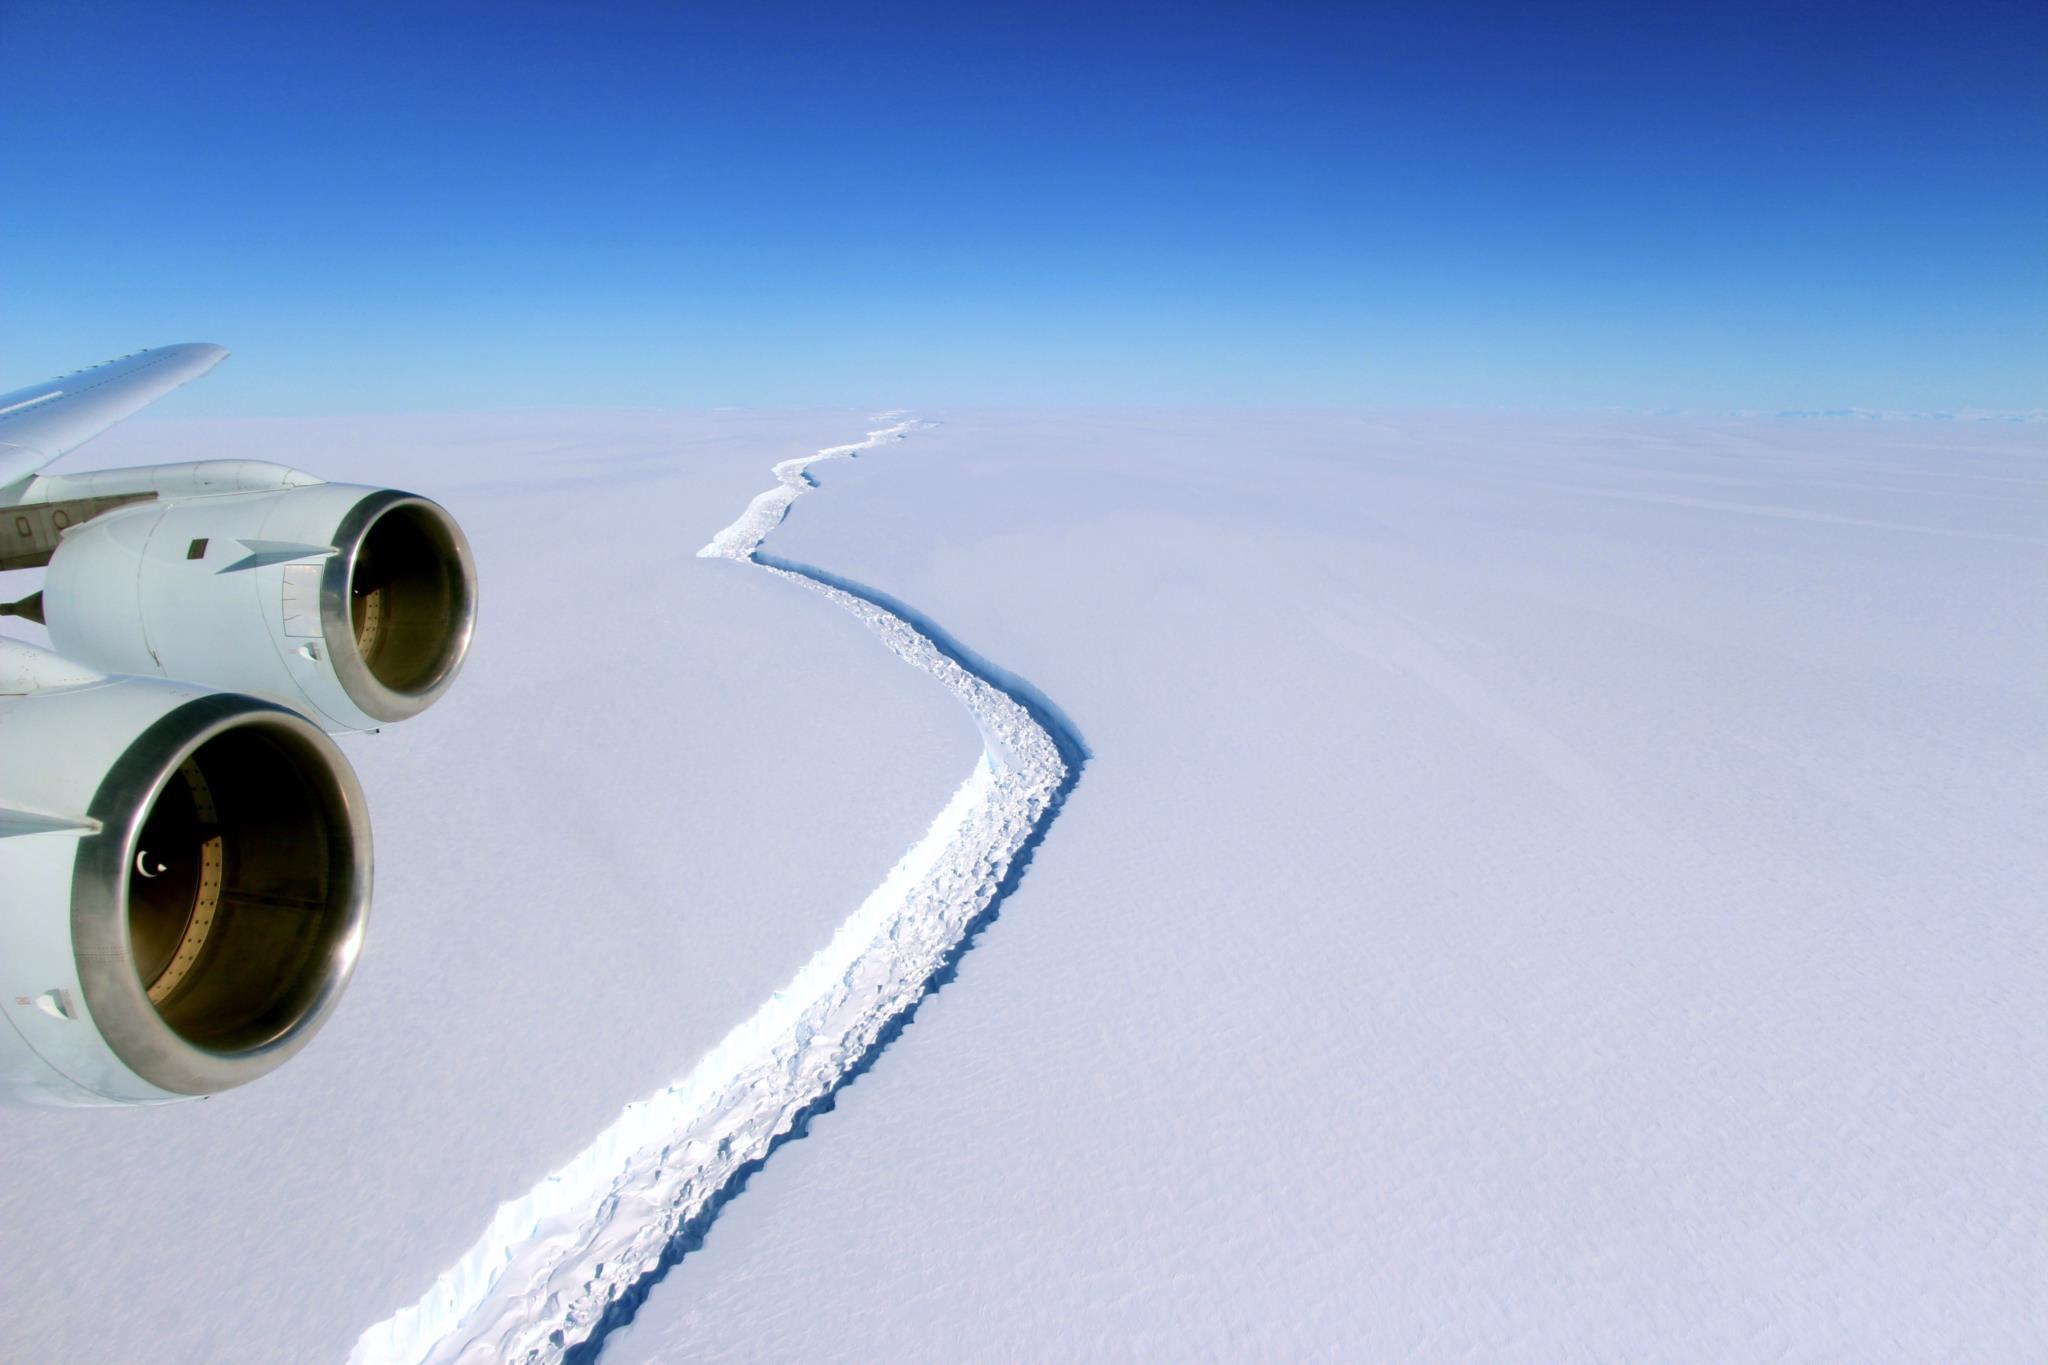 Icebergue gigante desprendeu-se na Antárctida